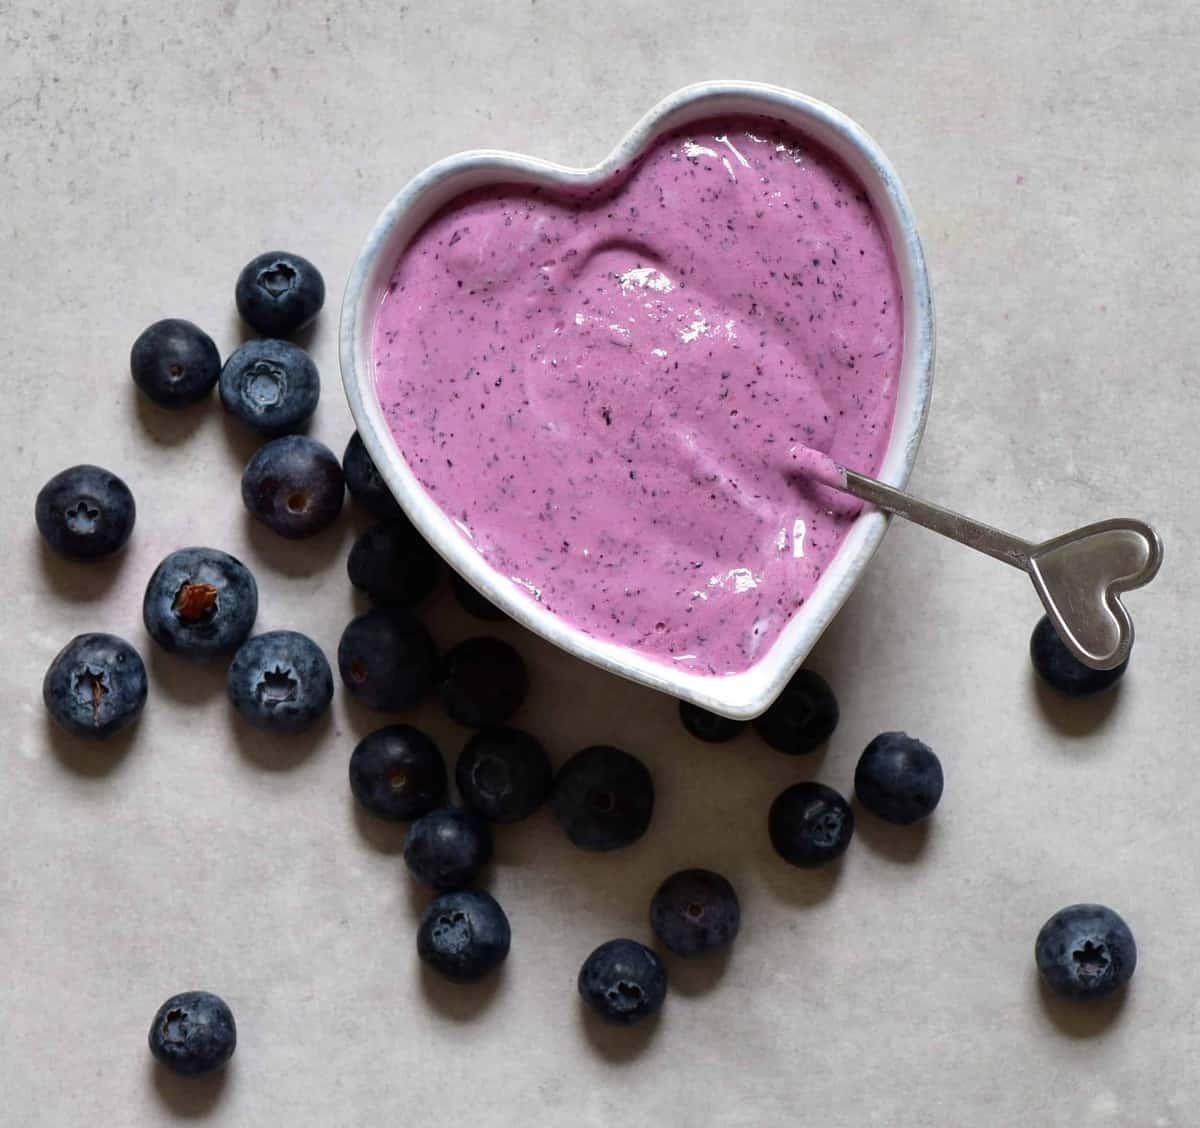 Blueberry yogurt